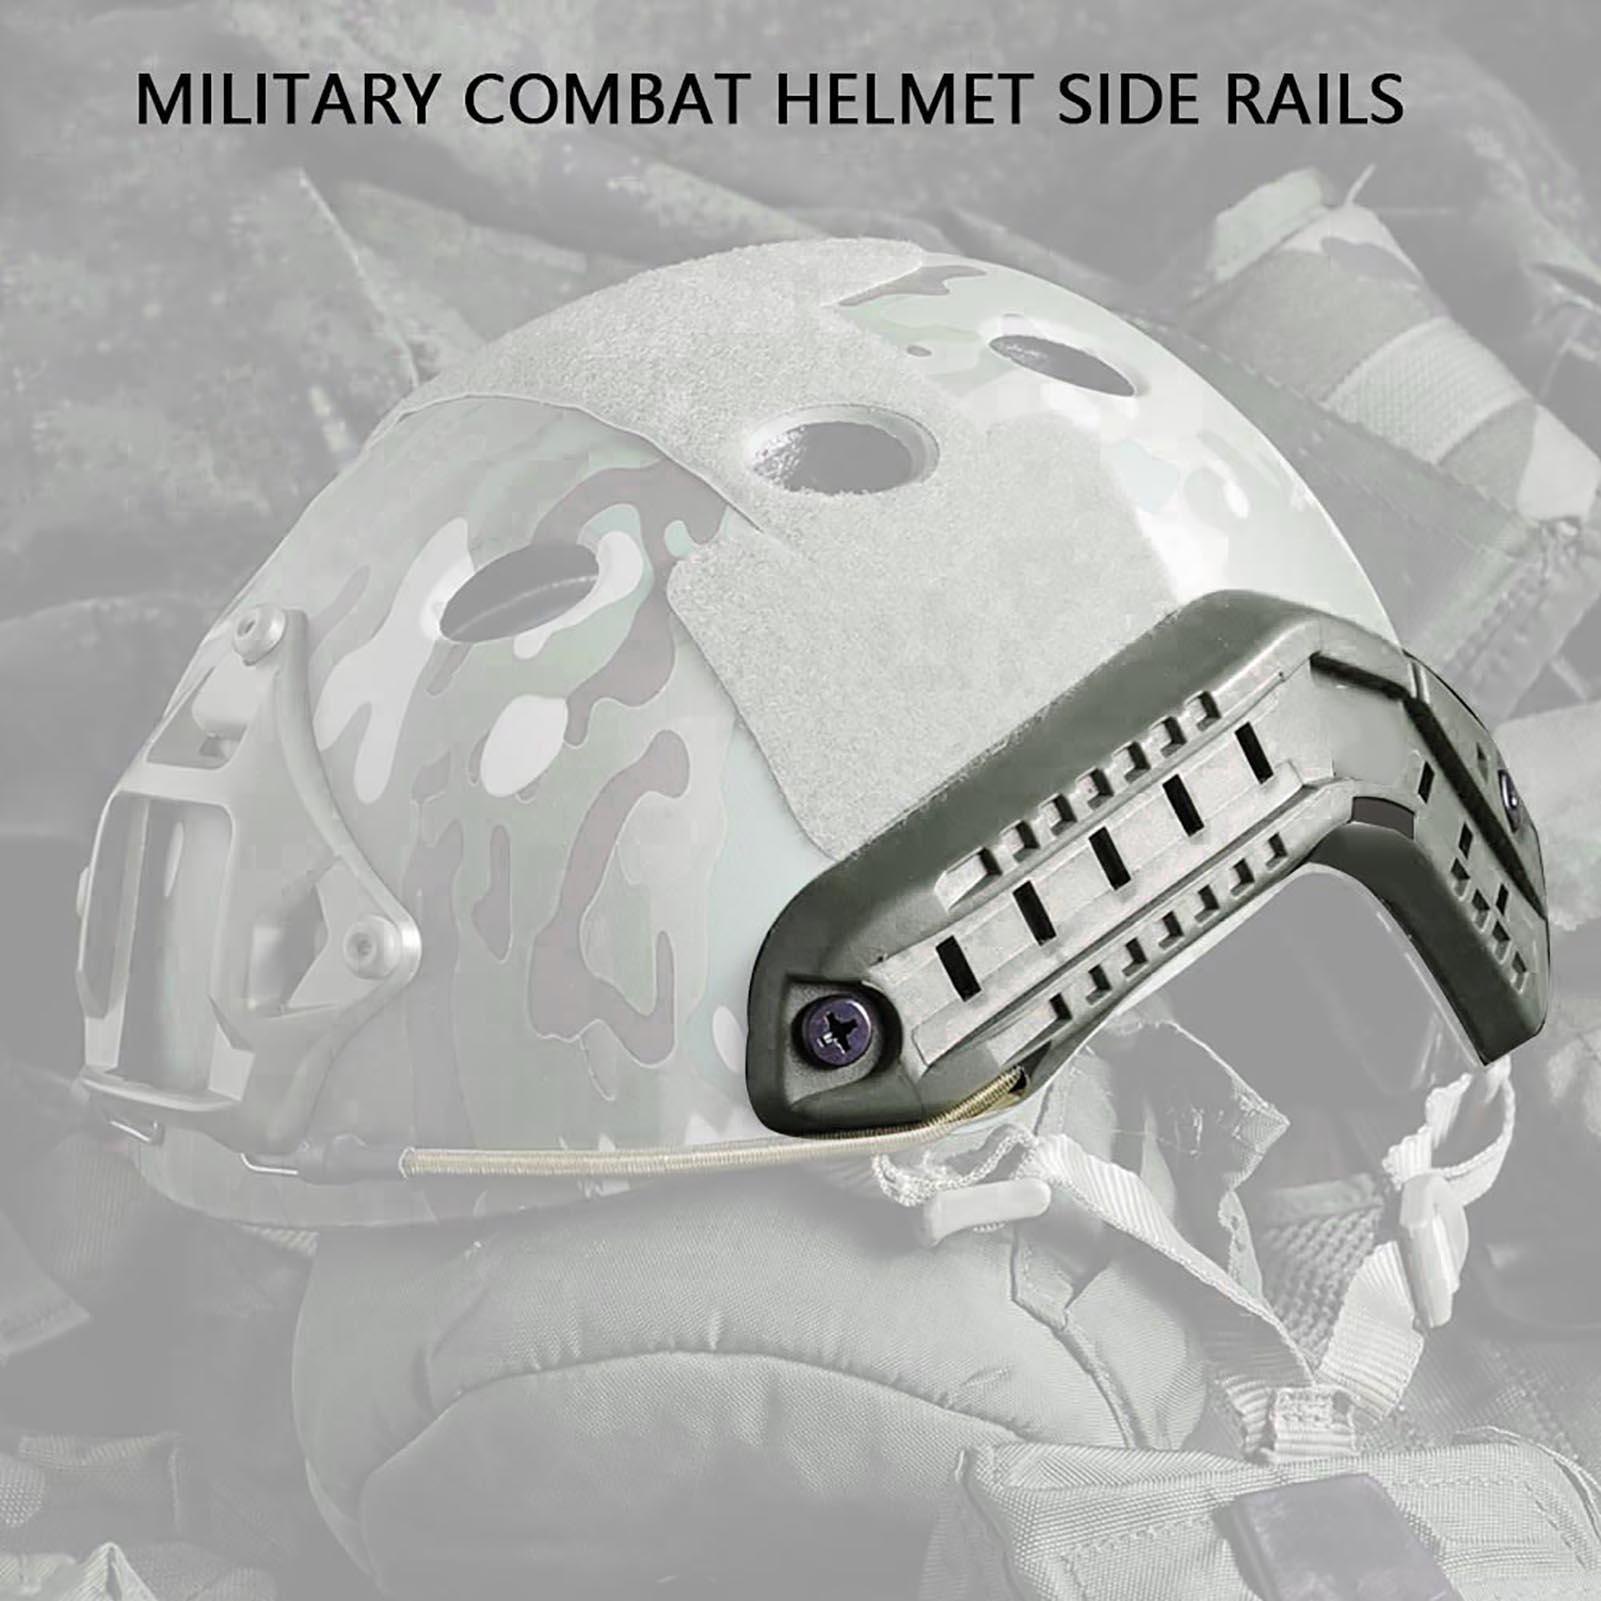 1Pair-Helmet-Side-Rails-for-Flashlight-Camera-Attachments-W-Mounting-Screws-Kit thumbnail 17